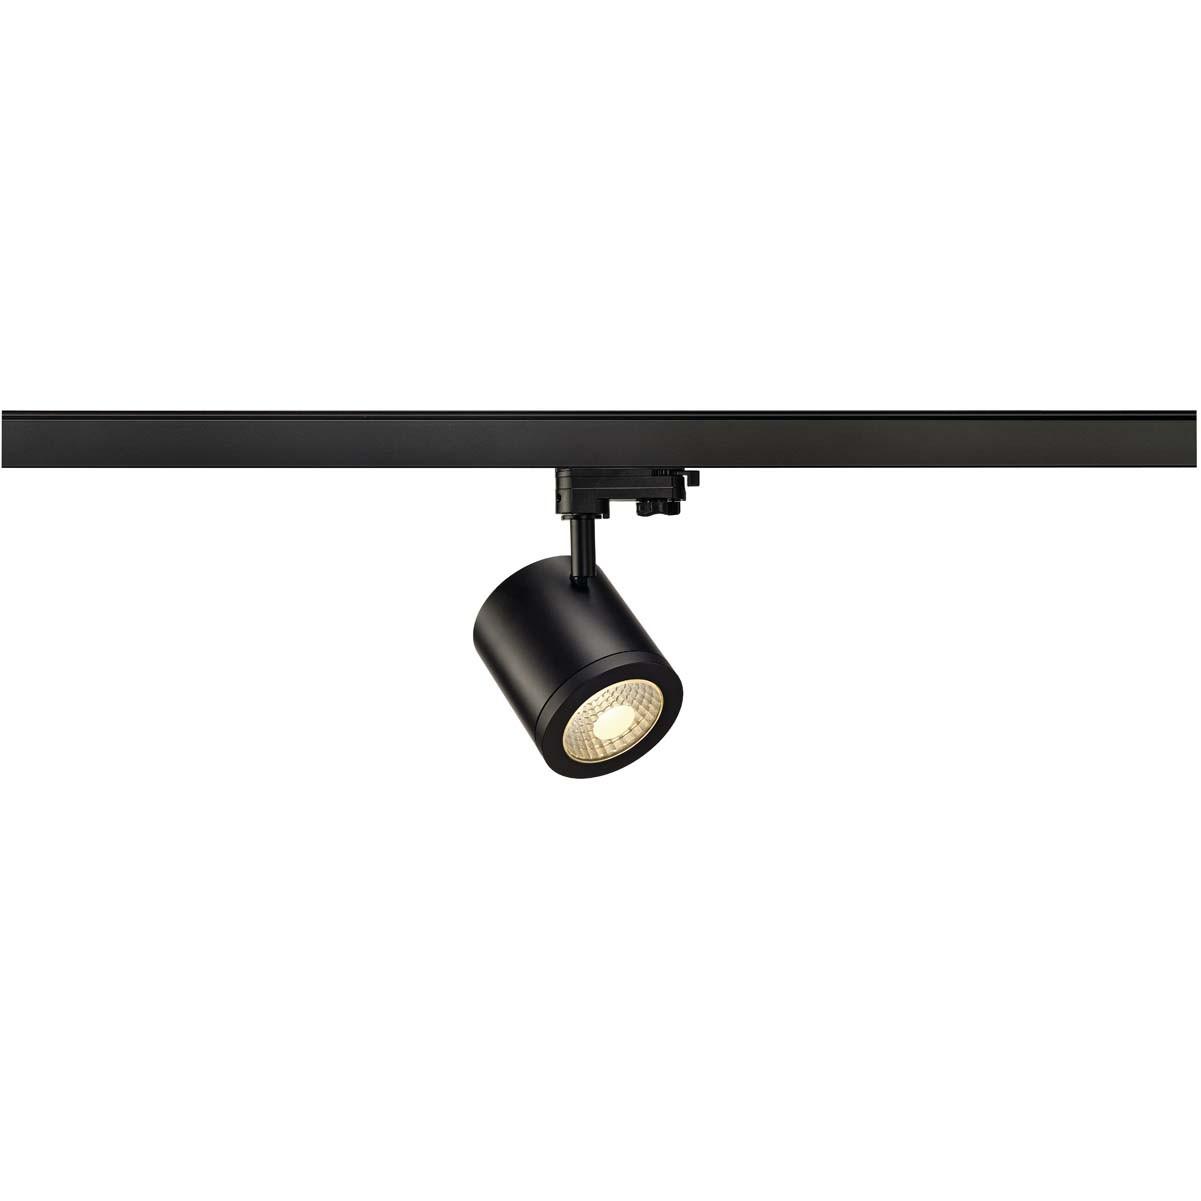 SLV 152420 Enola C9 LED 9W 3000K 35 Degree Black Eutrac 3 Circuit 240V Track Light